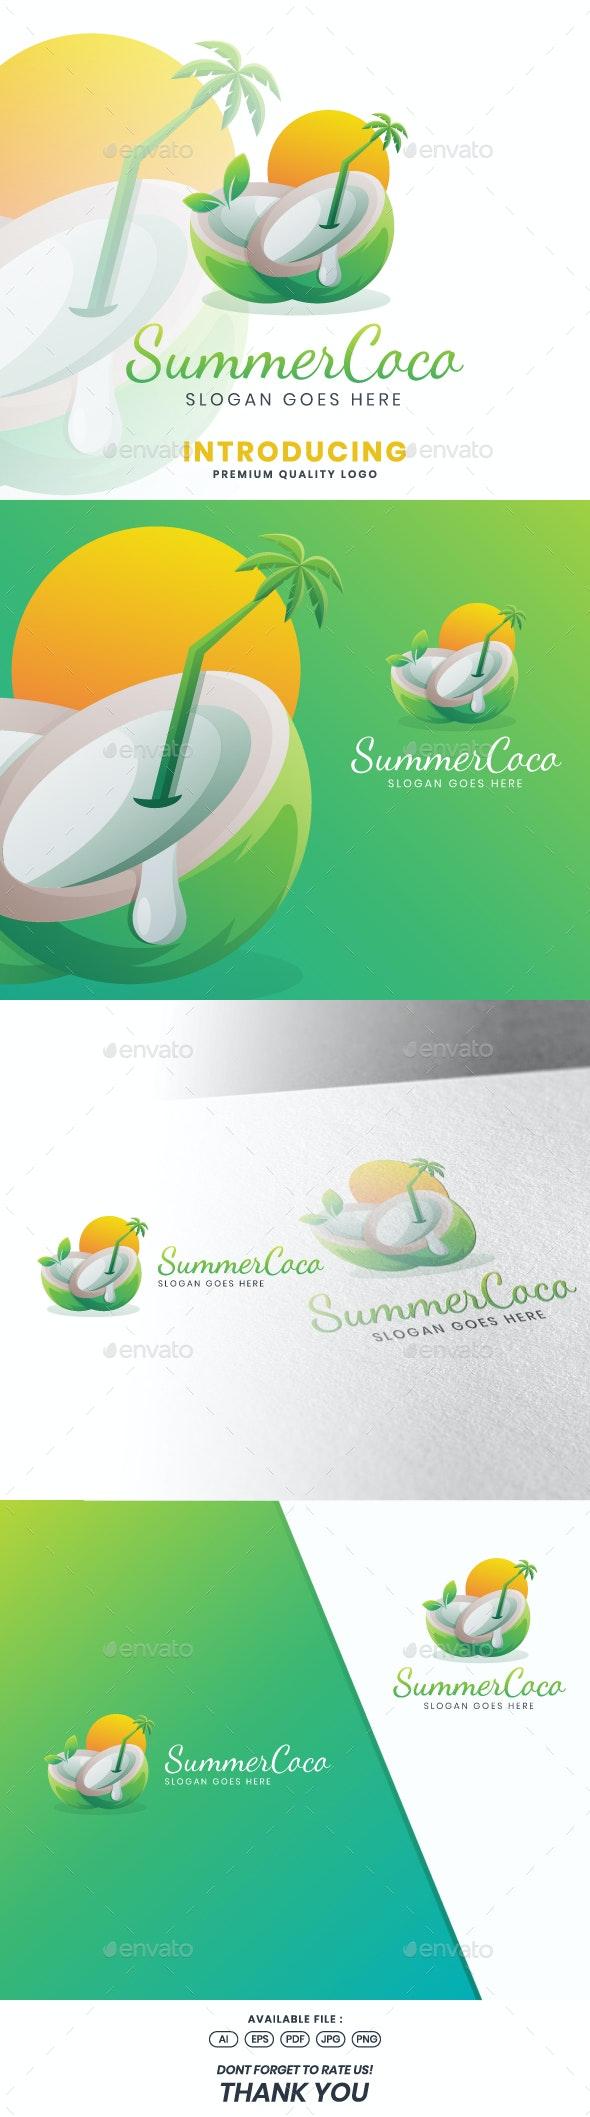 Summer Coco Logo Template - Food Logo Templates